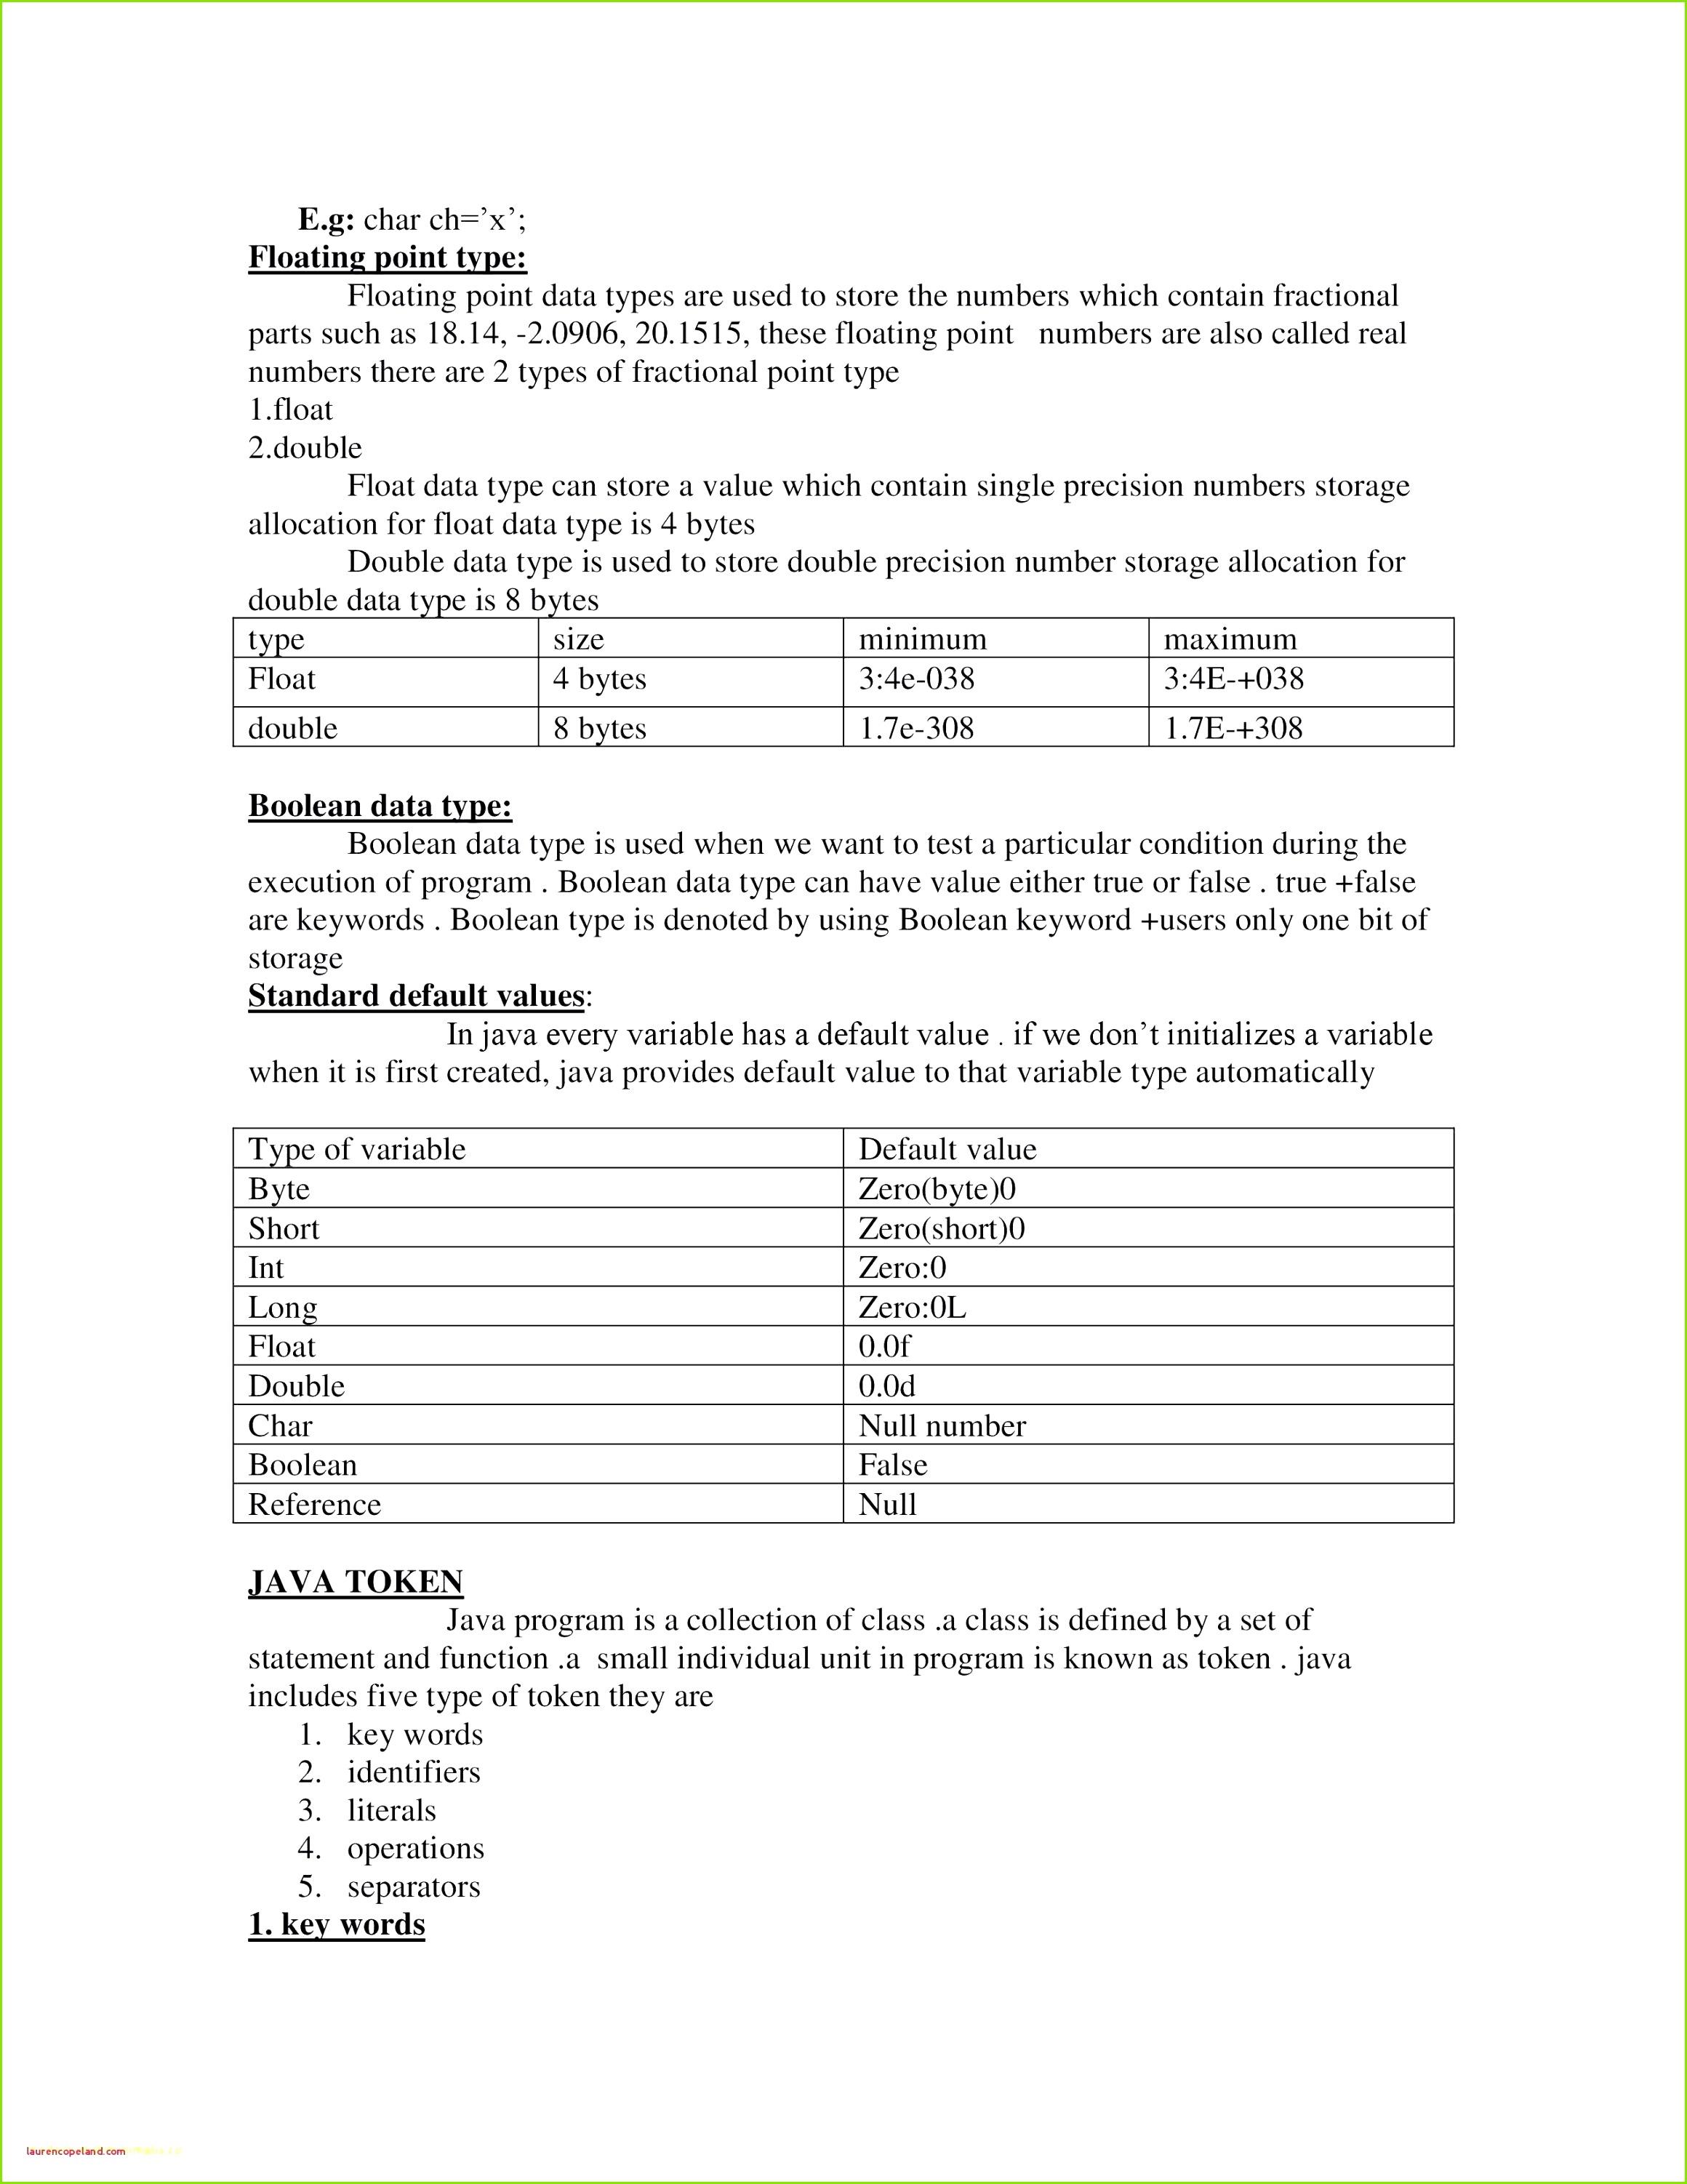 Flugticket Vorlage Download Inspirierende Speisekarte Blanko Vorlage Köstlich Flugticket Vorlage Download